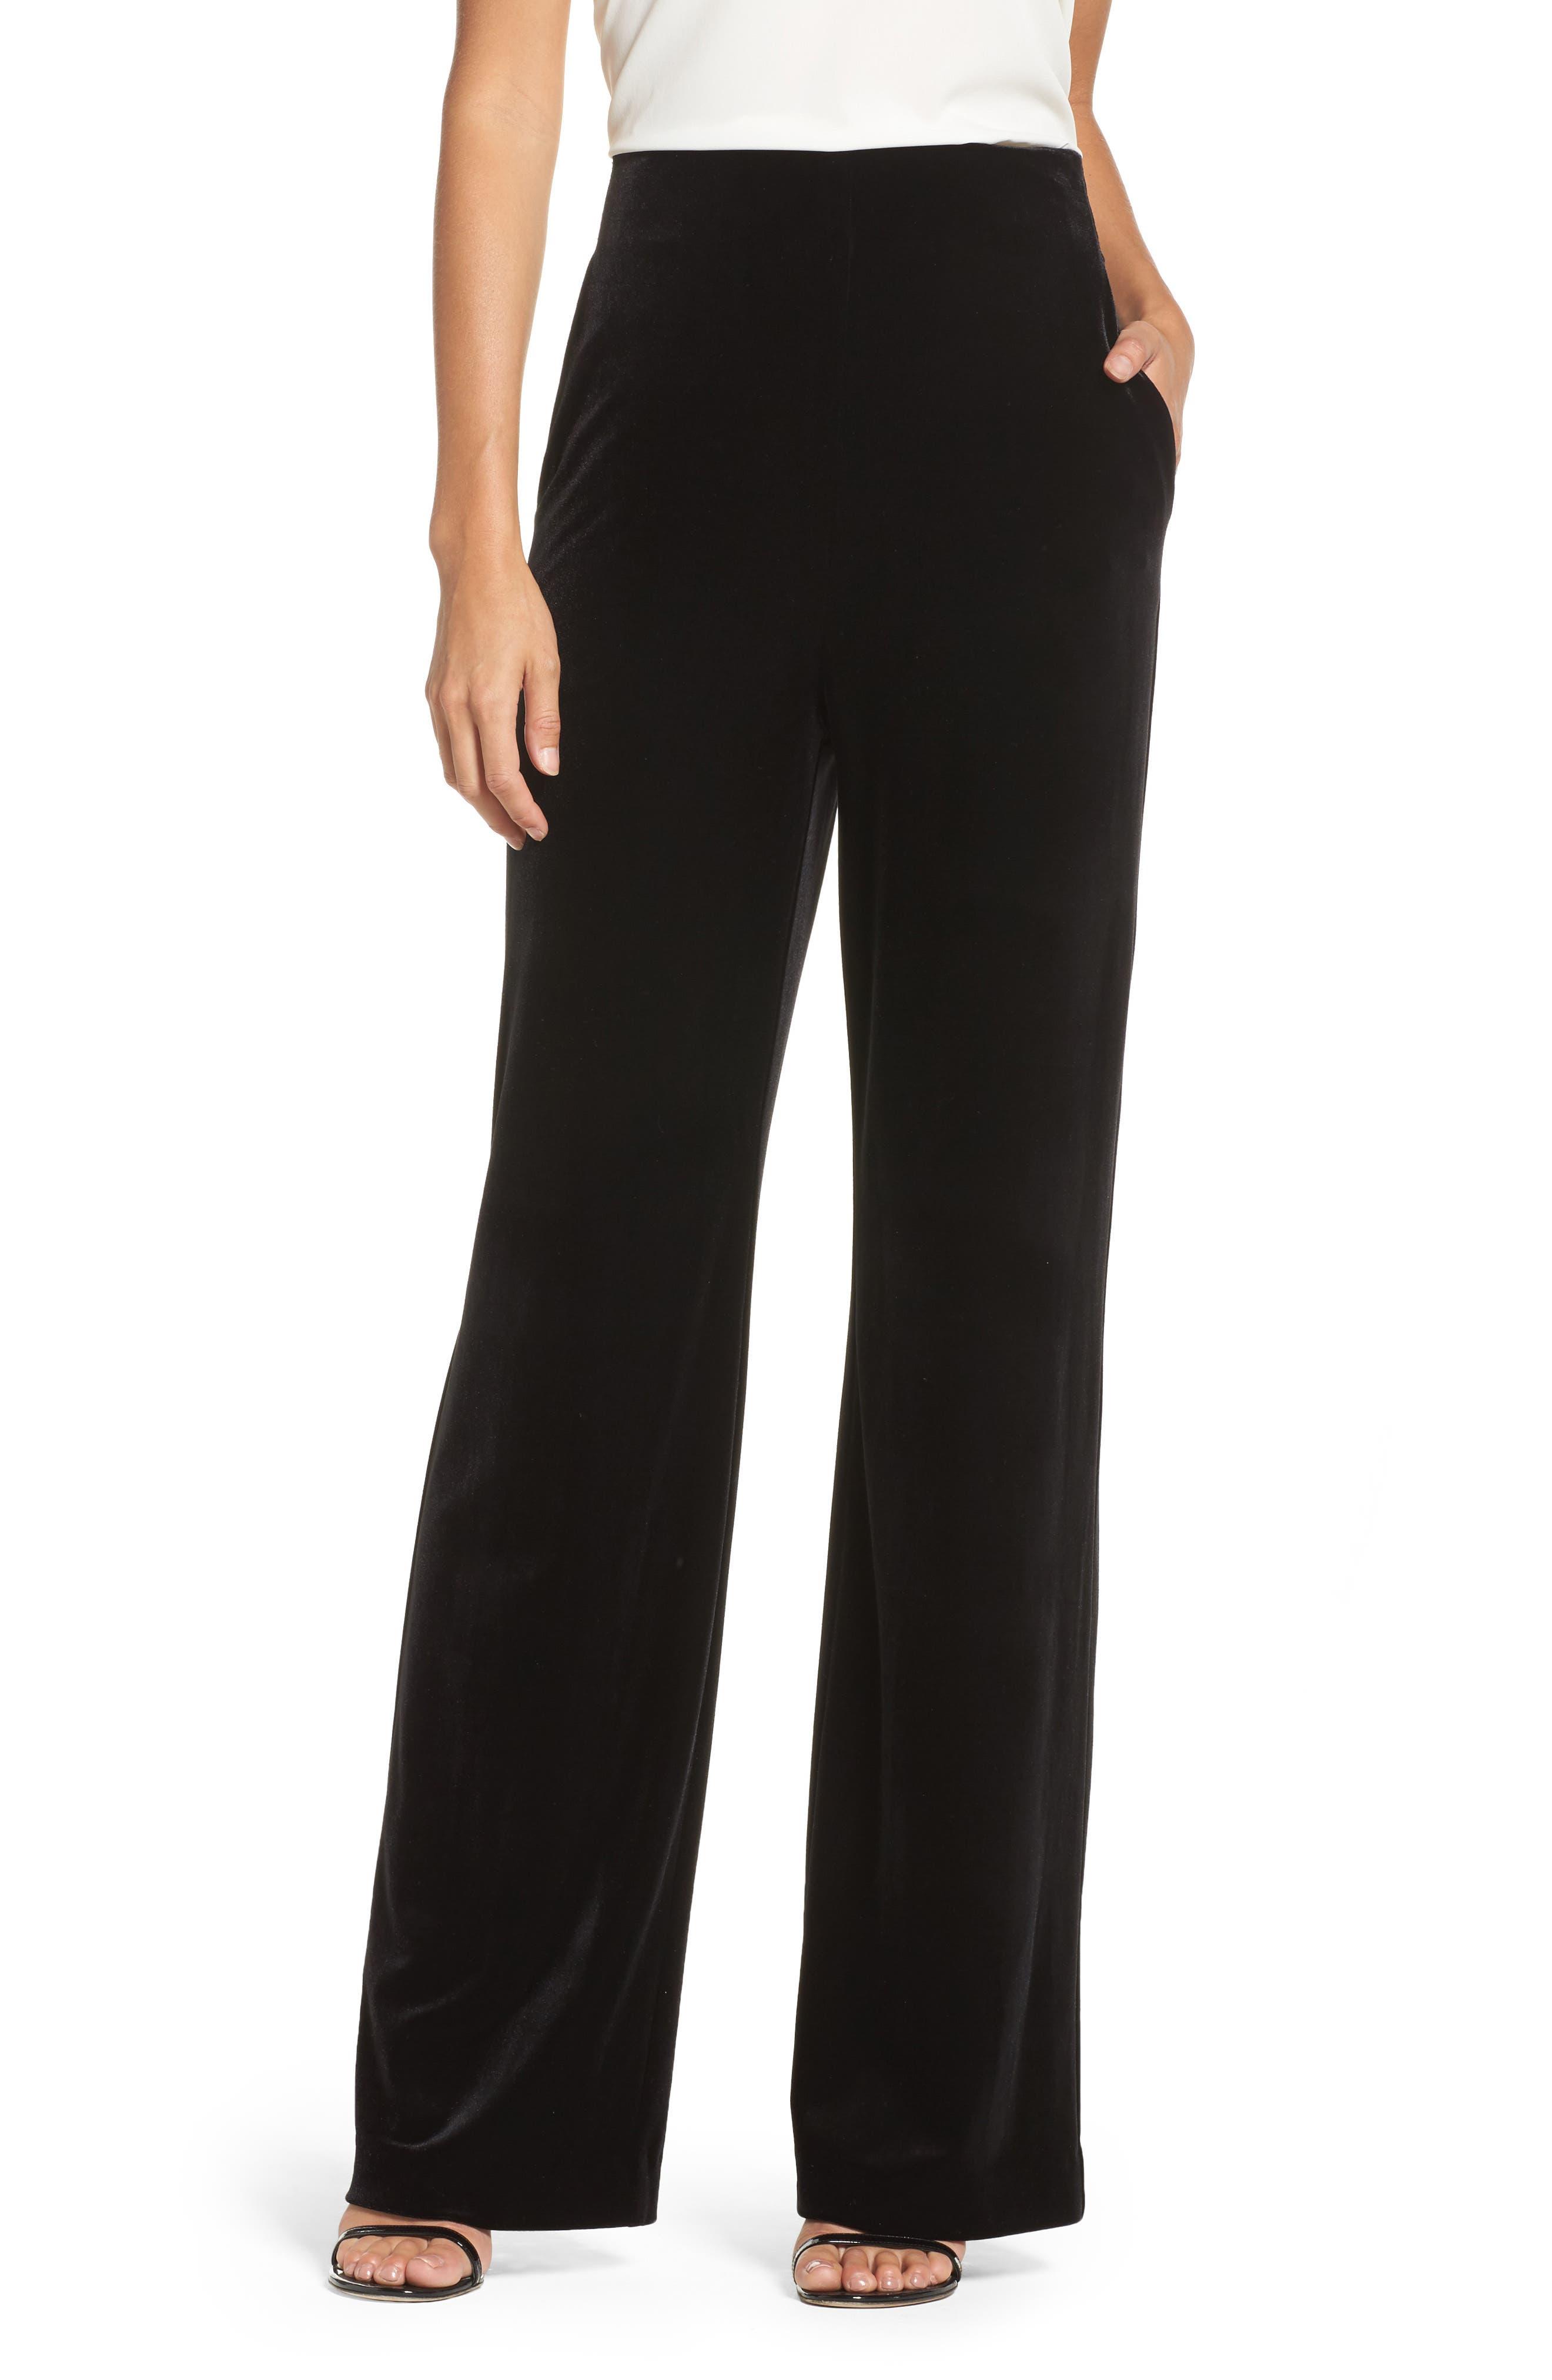 Velvet Trousers,                             Main thumbnail 1, color,                             Black